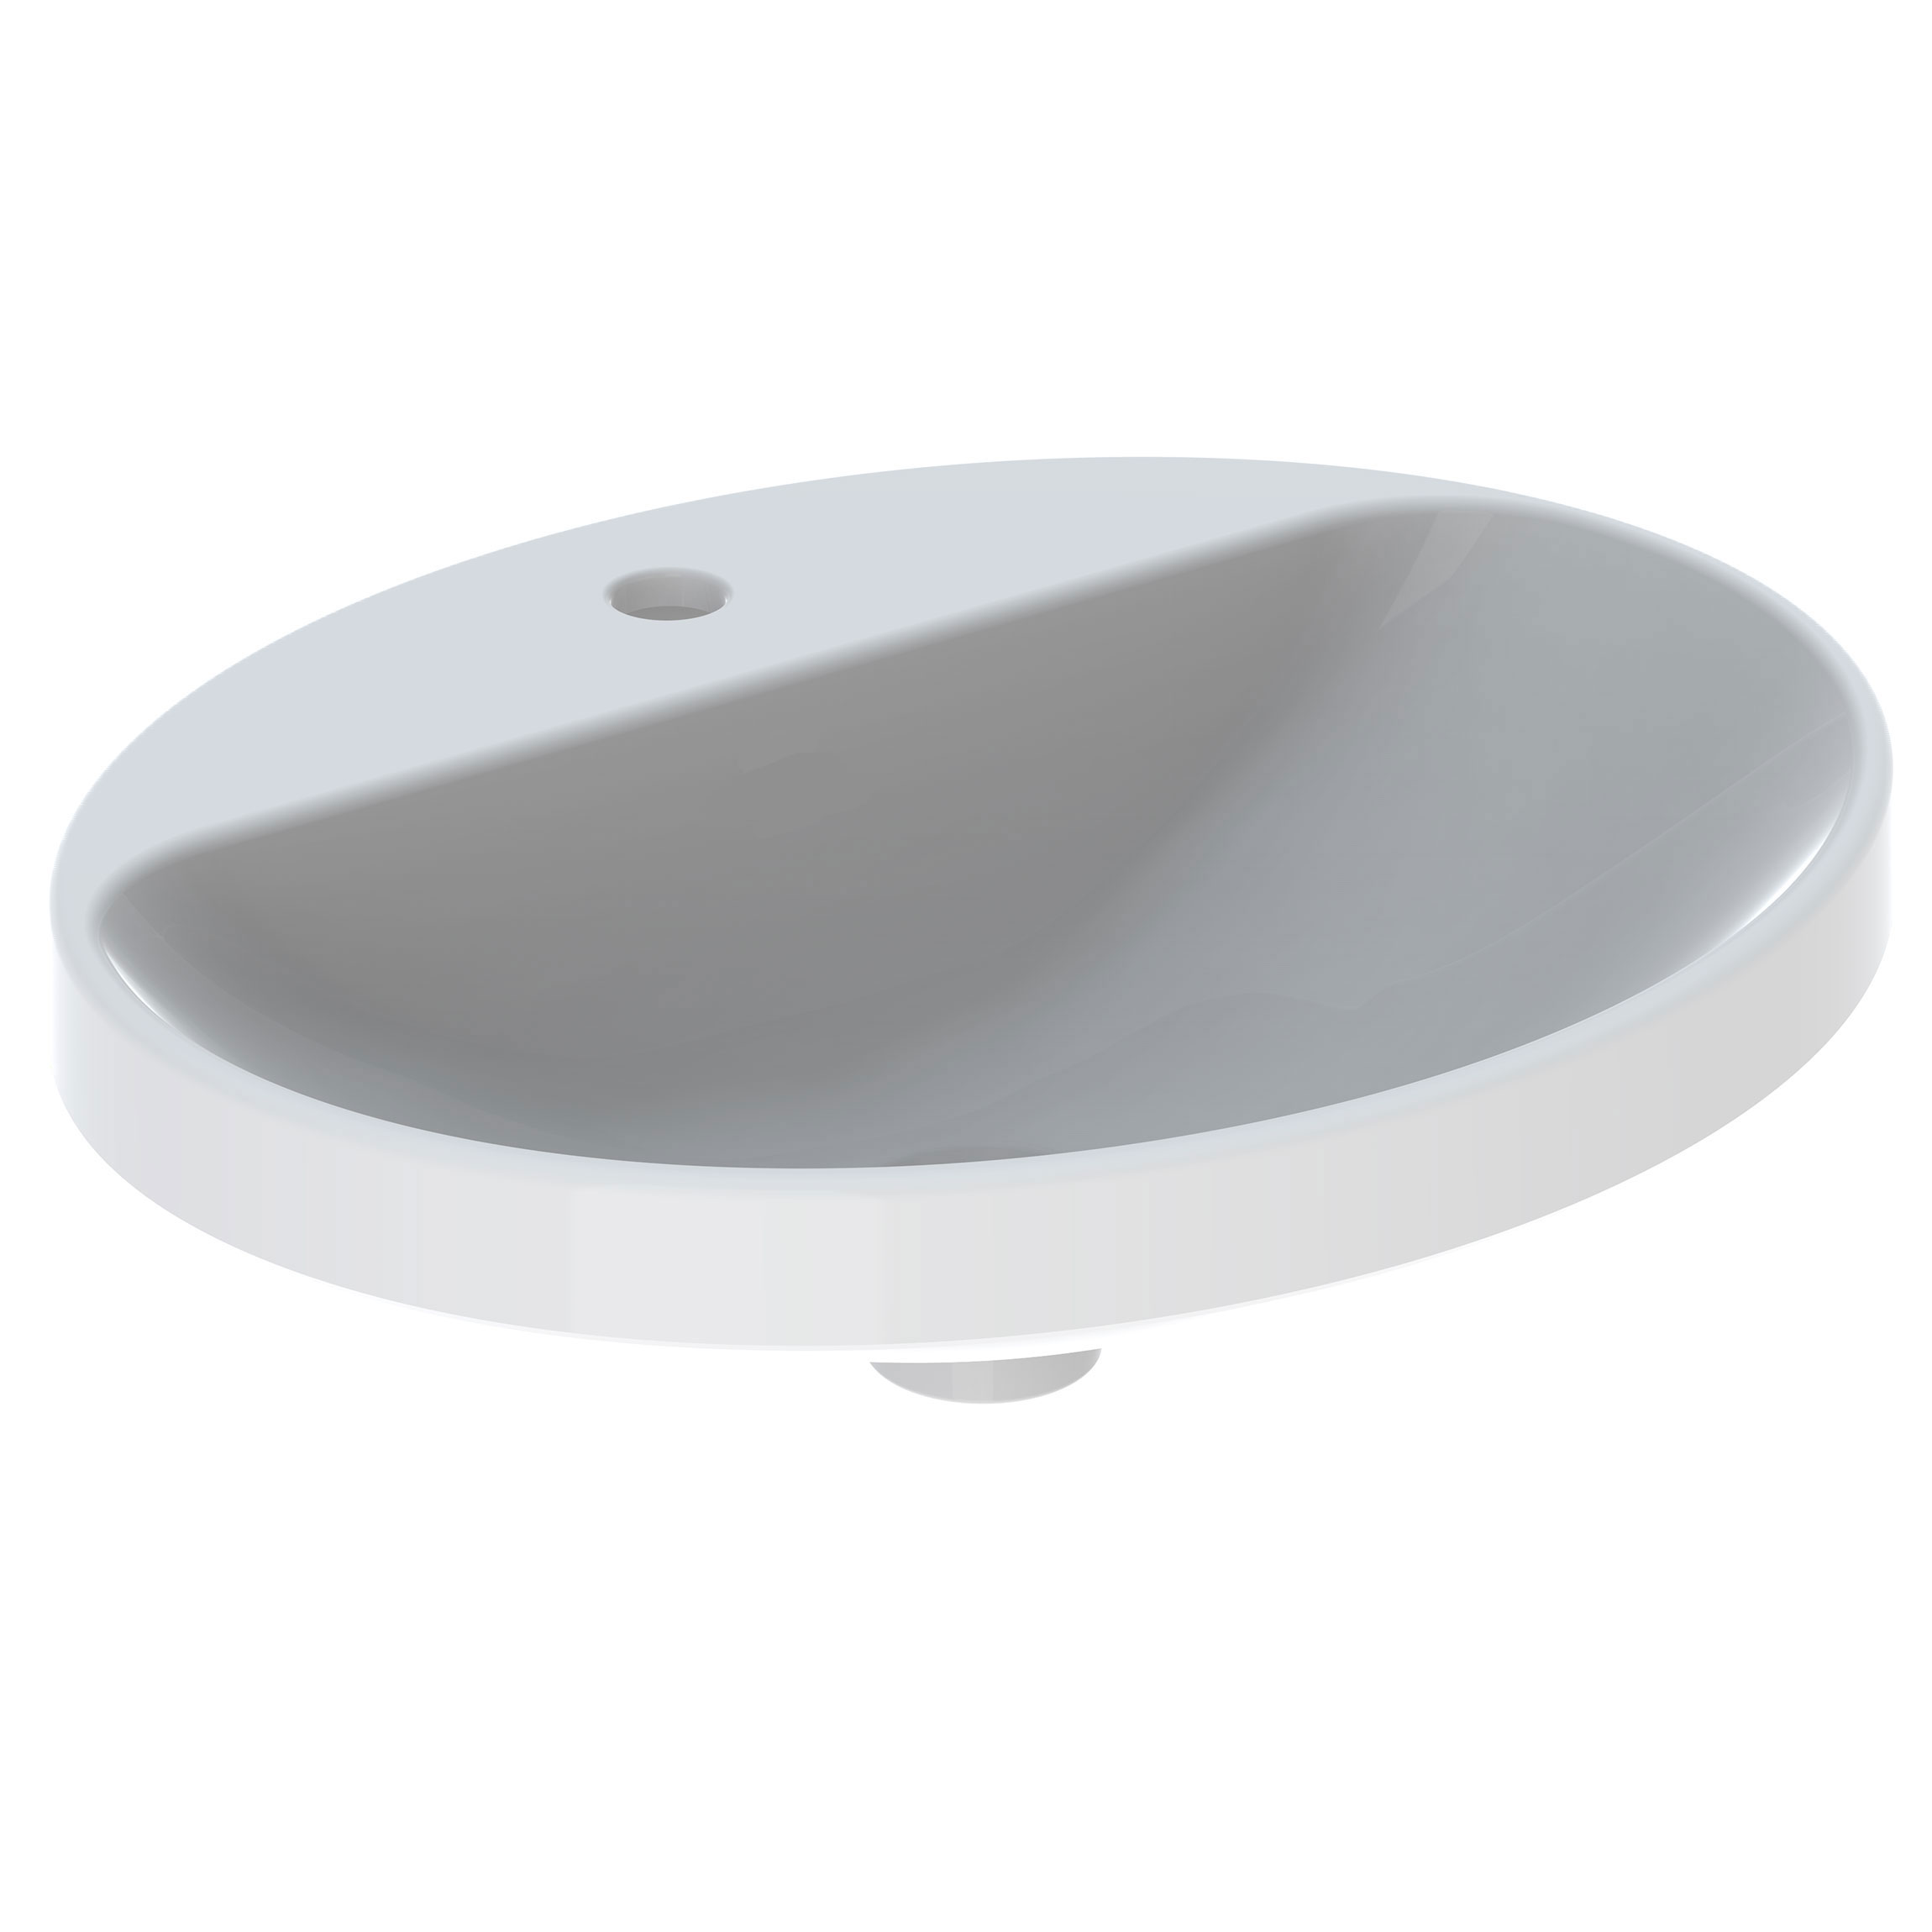 Tvättställ Ifö Variform 550 mm Infälld Ovalt Kanthylla